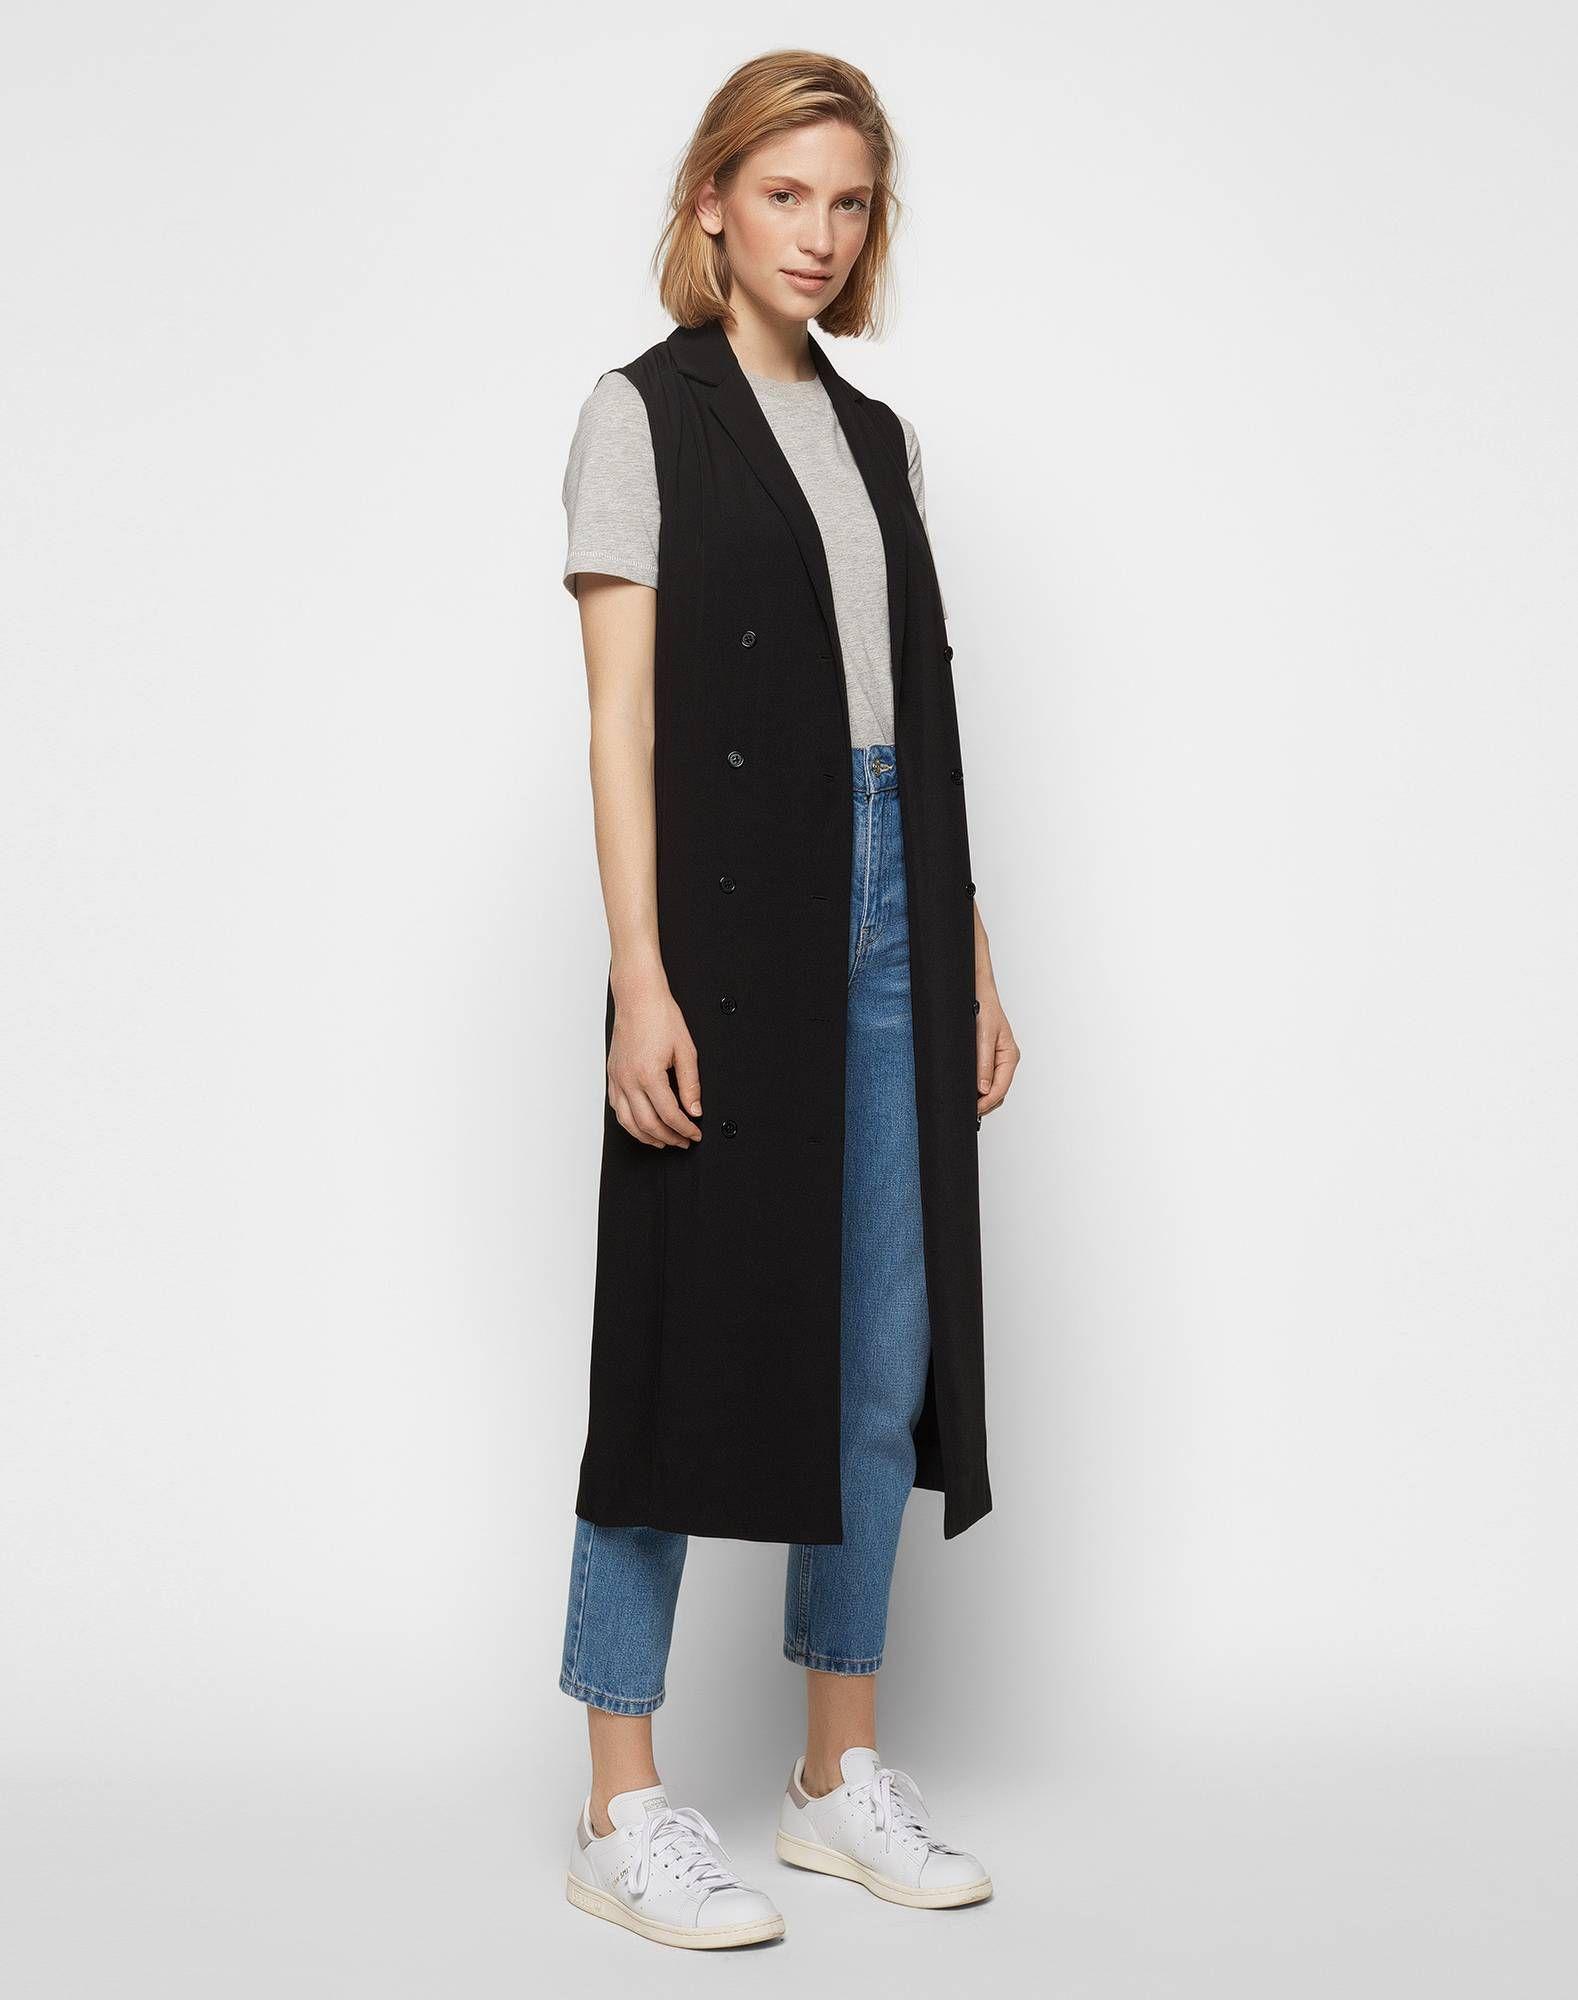 Kleid im Westen-Stil \'Gia\' | What\'s there to wear! | Pinterest